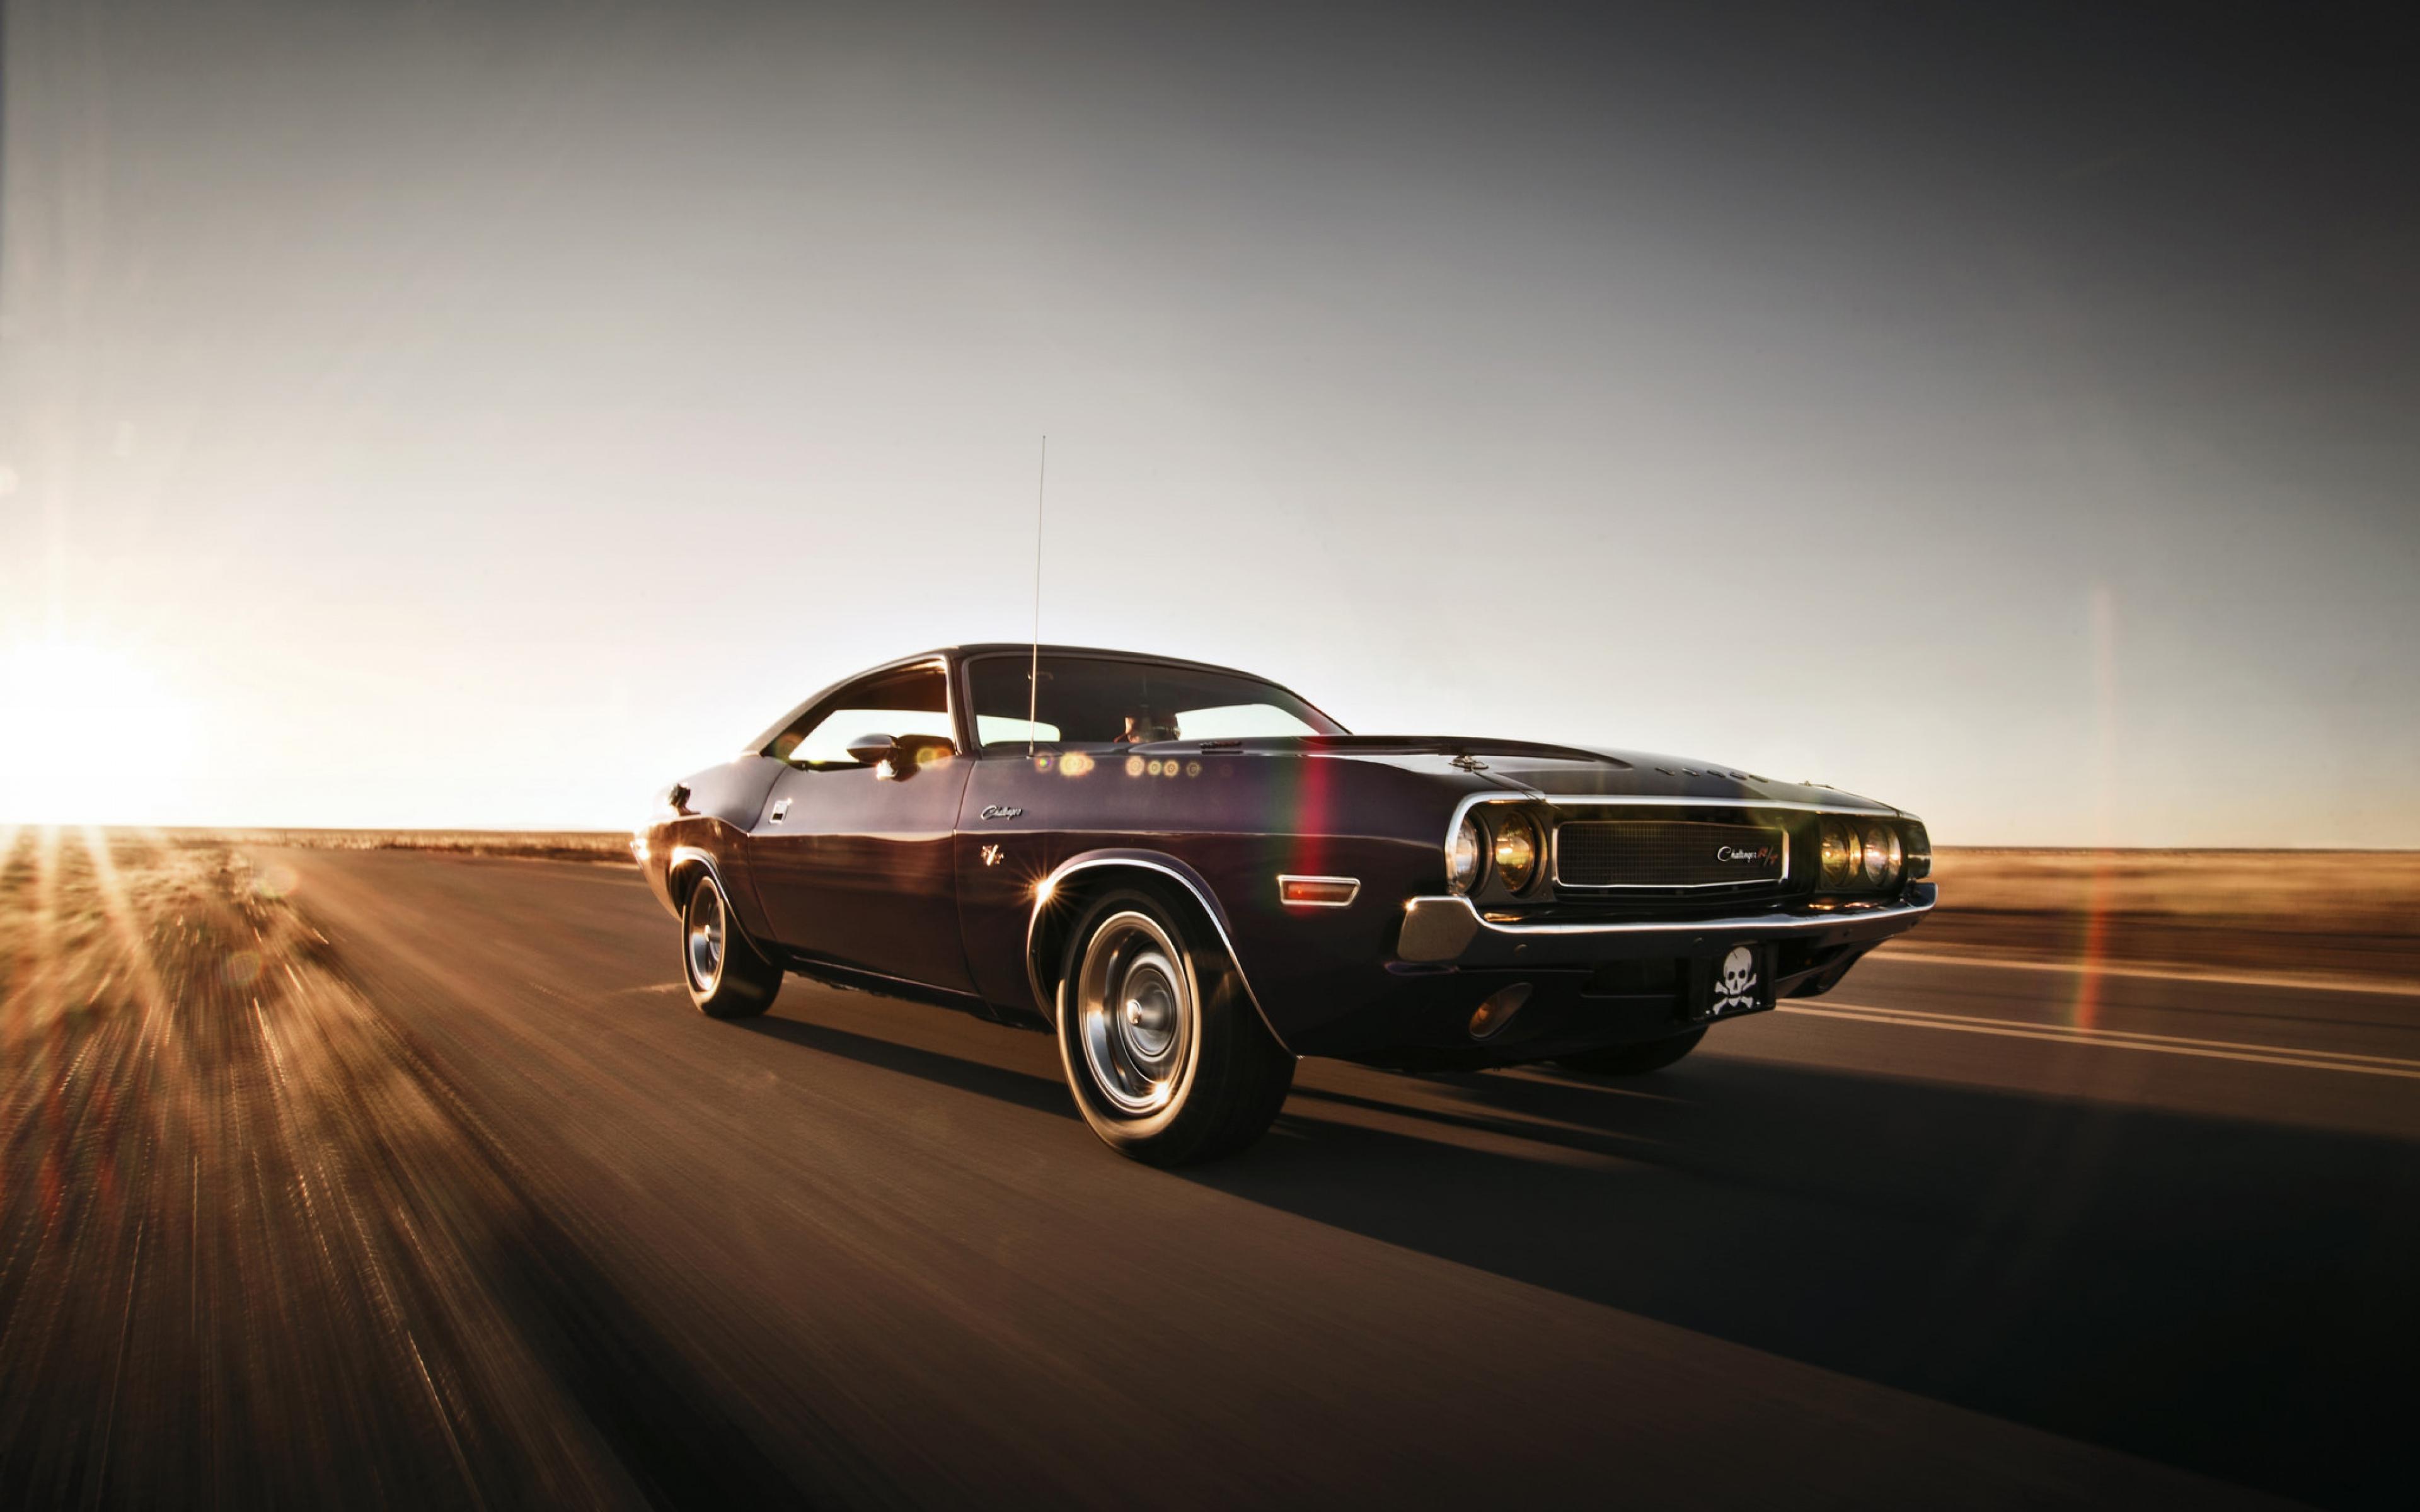 Dodge Challenger In Desert Speed Car HD Wallpaper 3840x2400